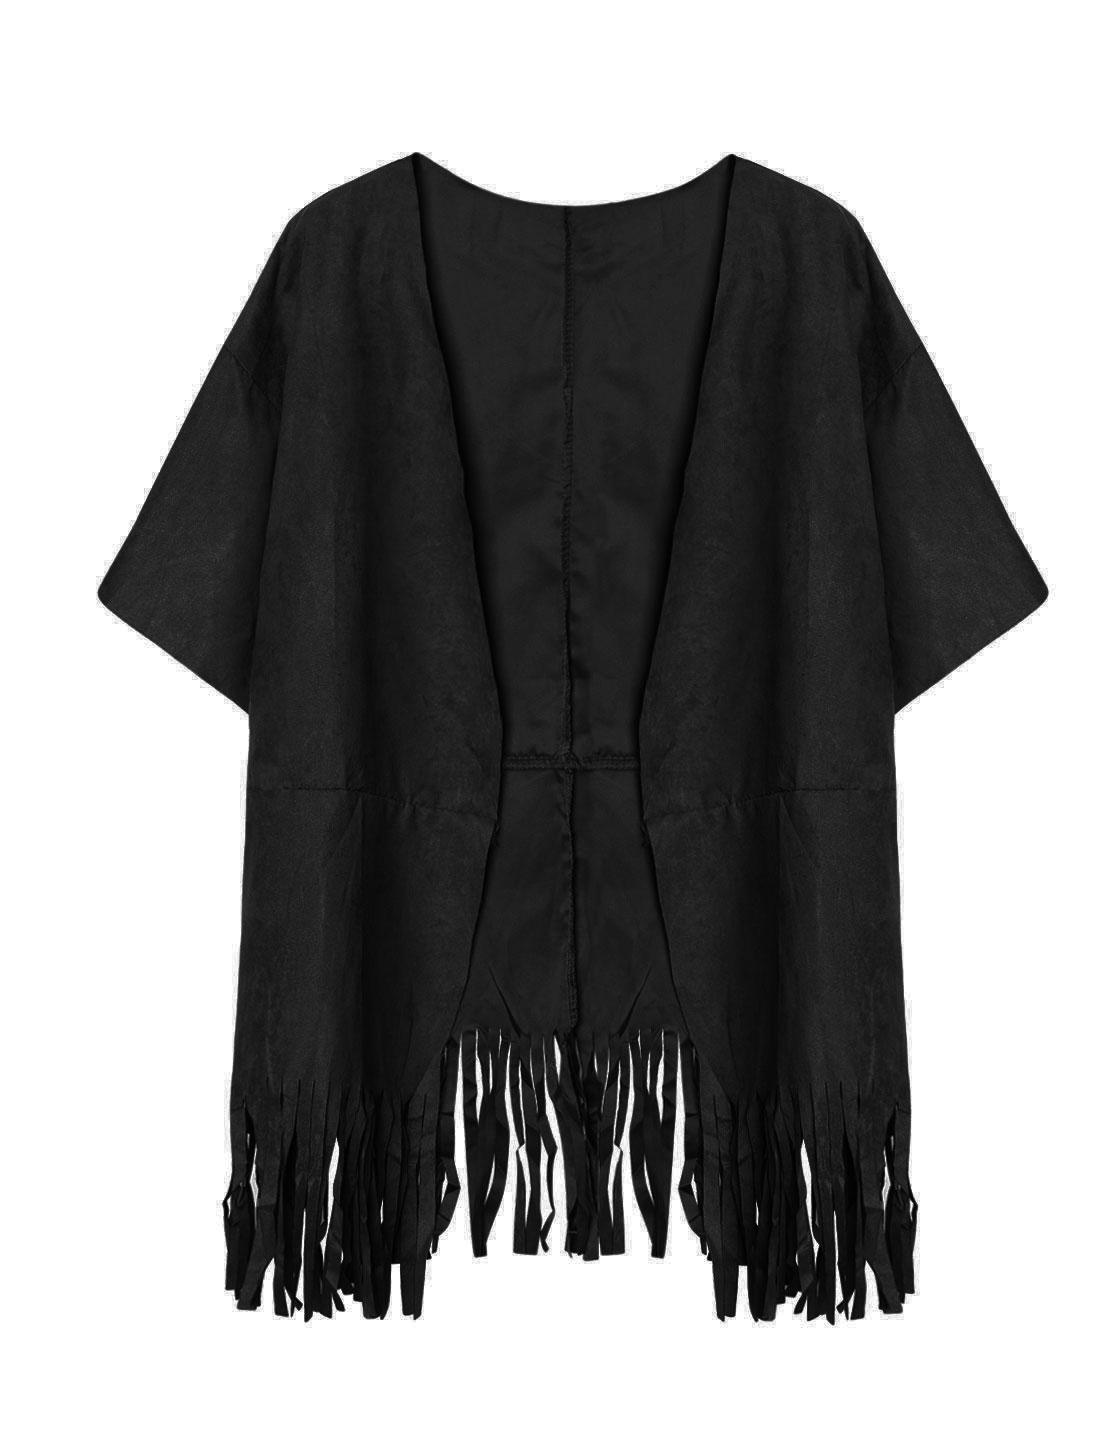 Women Batwing Sleeves Loose Tunic Tassels Cardigan Black XS